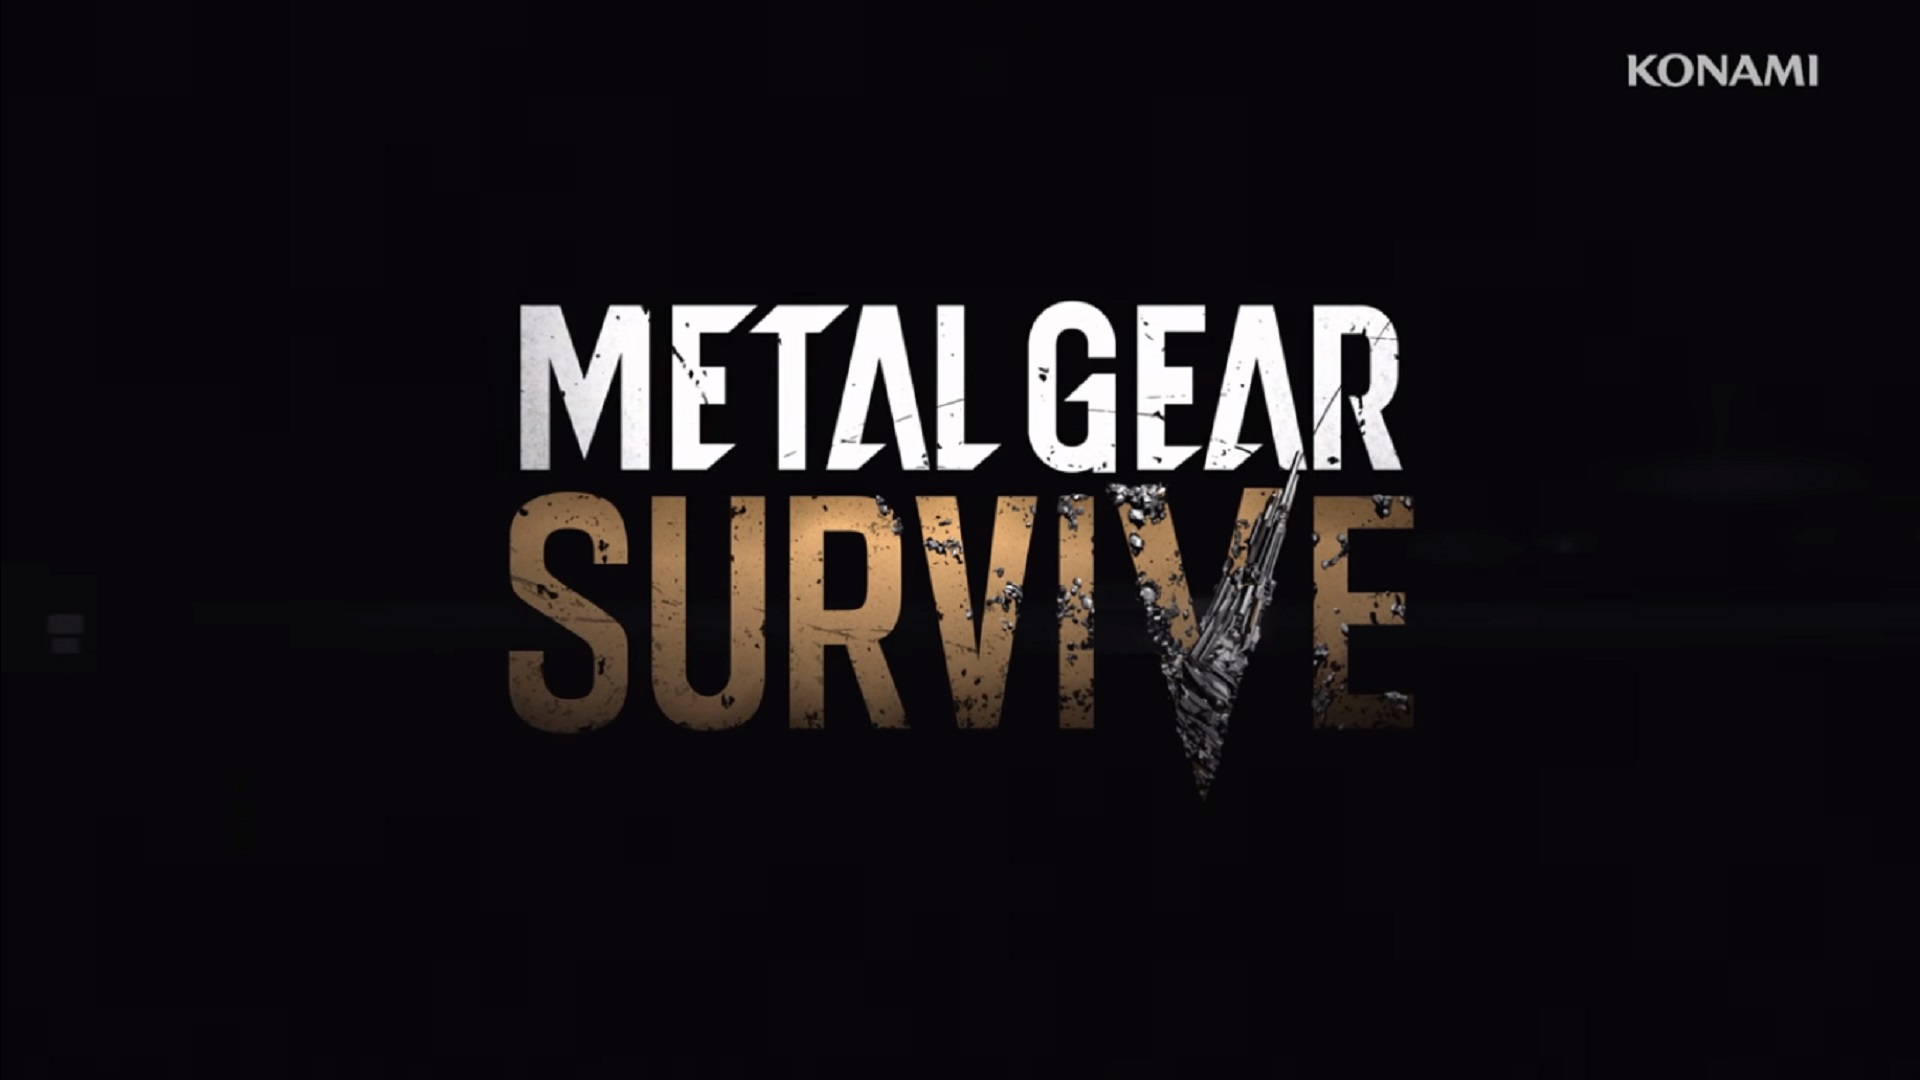 metal gear survive latest wallpaper